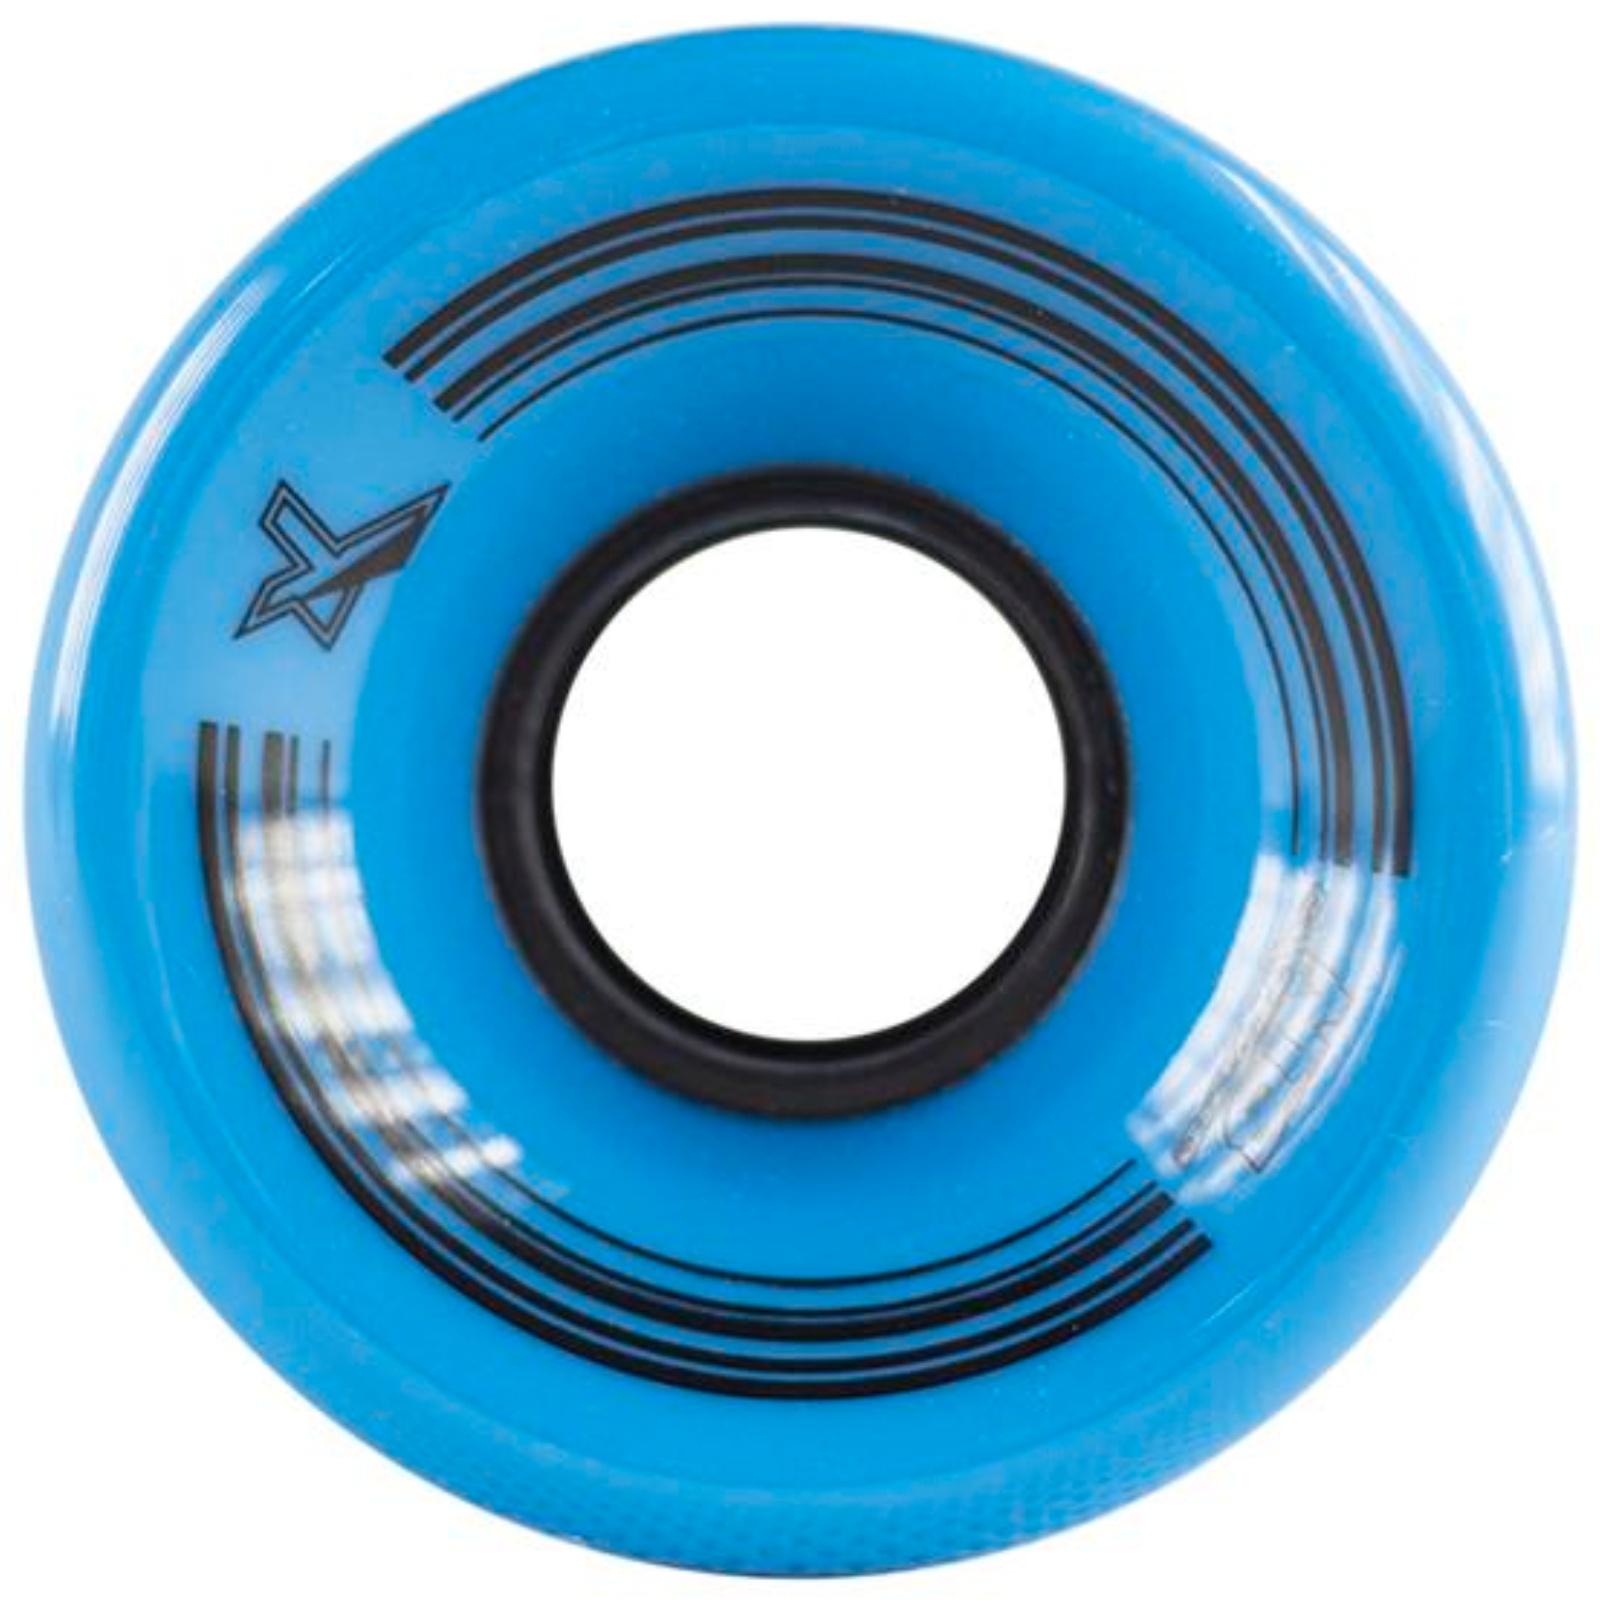 Kolečka pro plastik board 60 x 45 mm NILS Extreme - modré